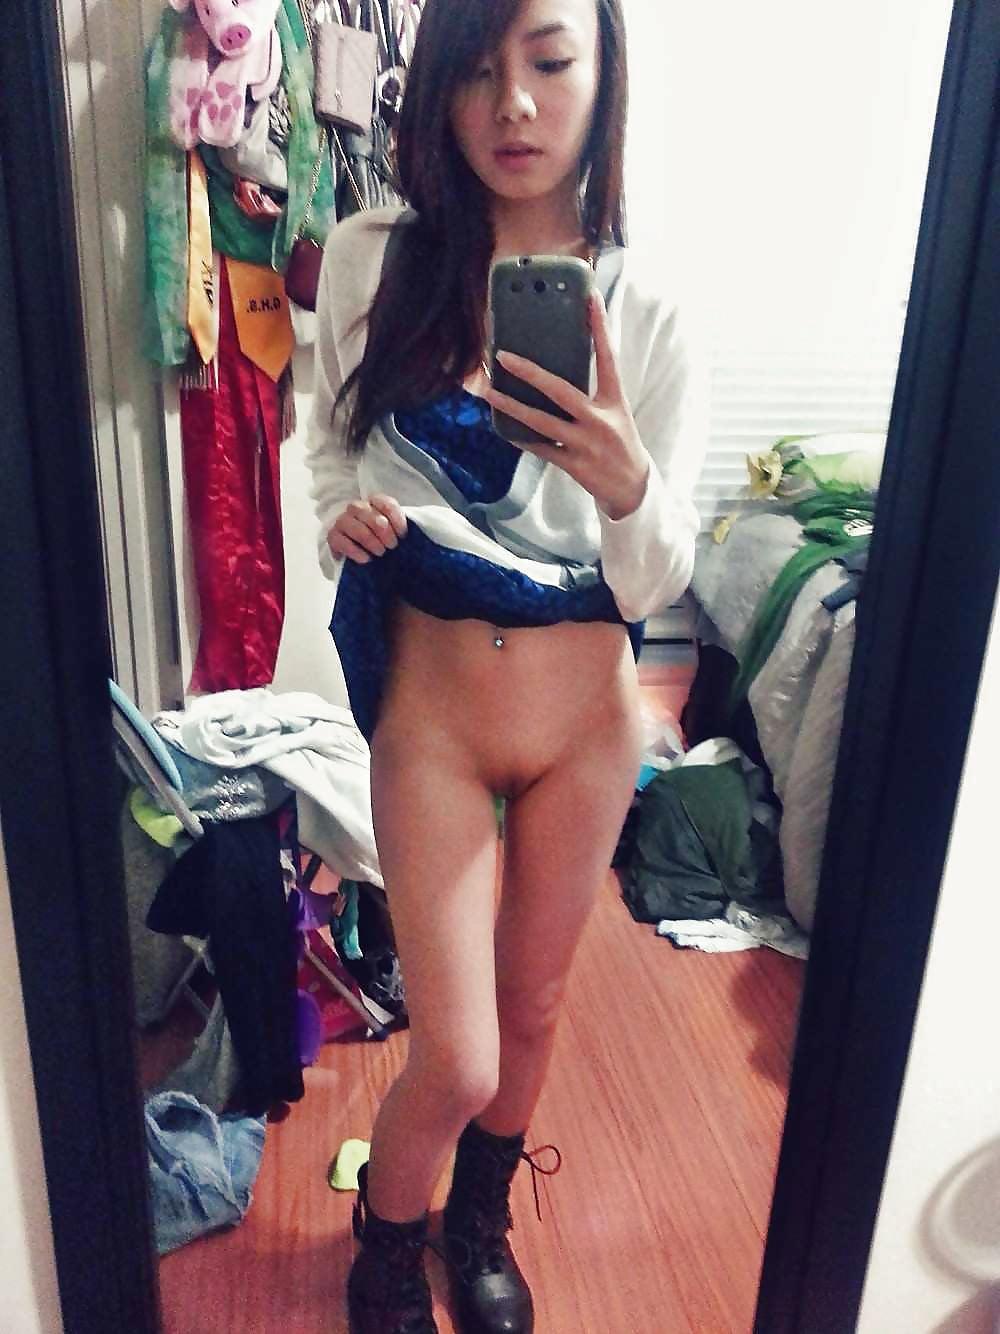 Jovecita ecuatoriano se desnuda para su novio - 1 part 6